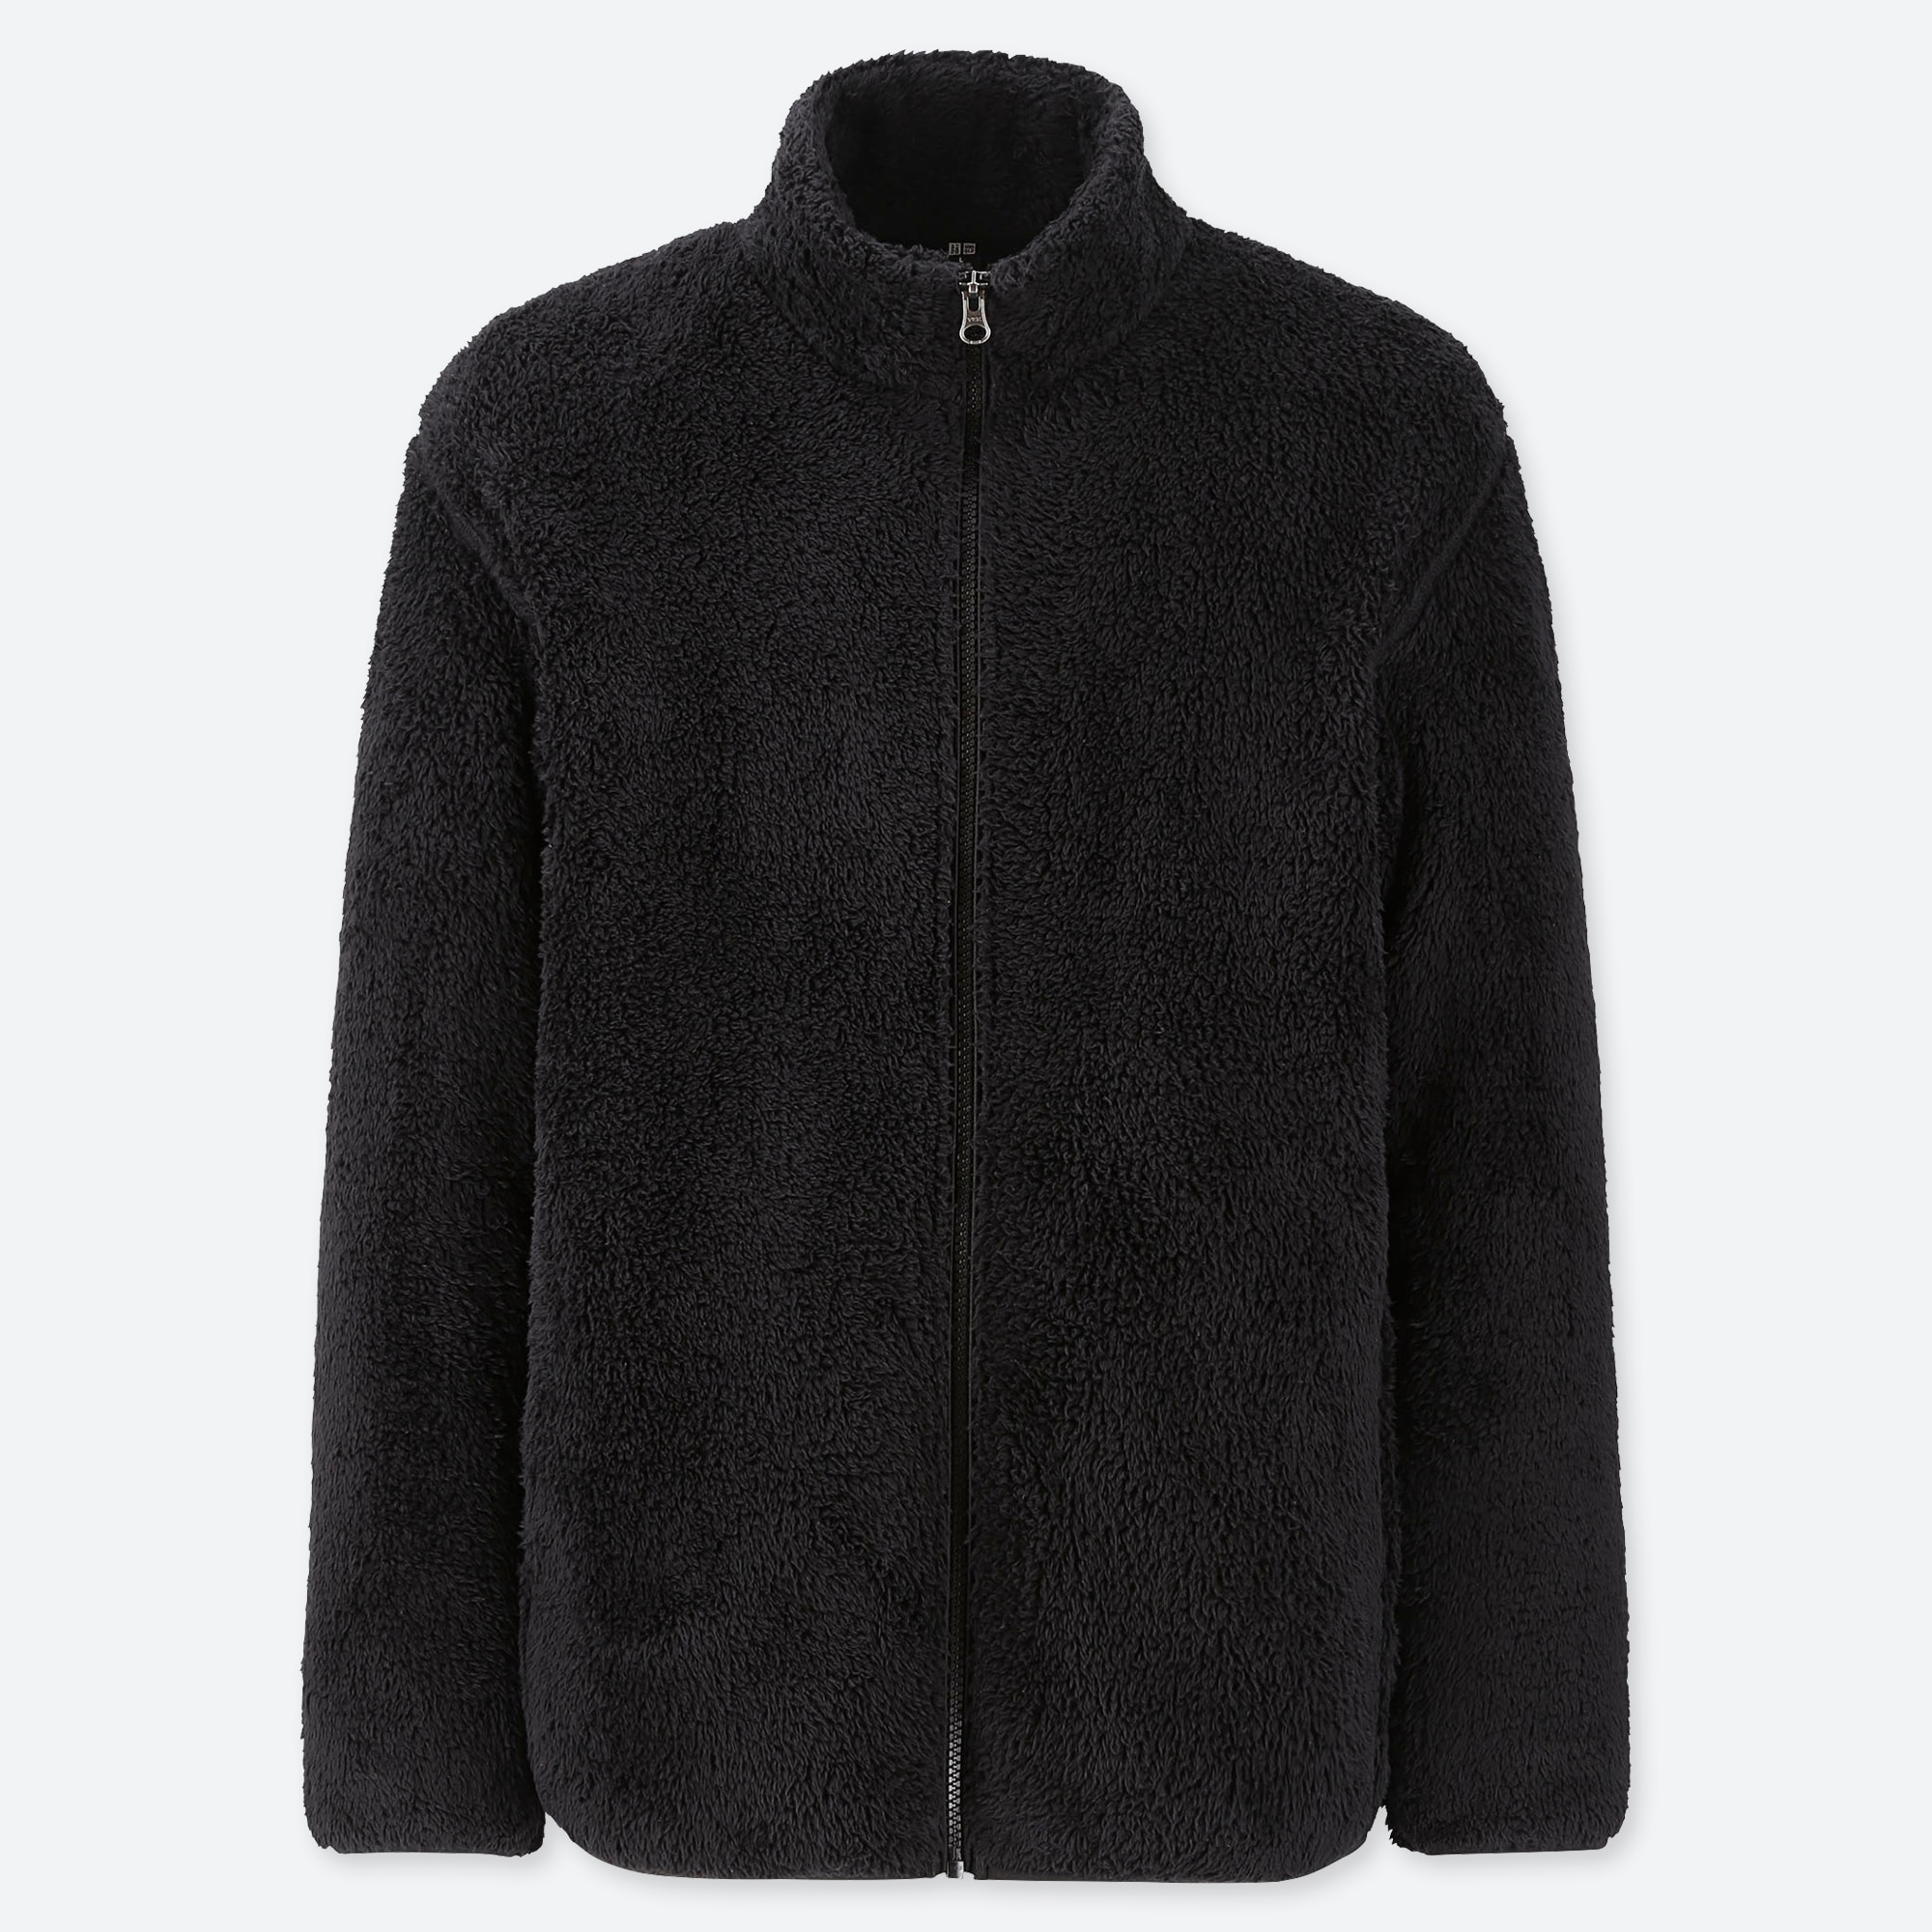 UK Mens Fleece Lined Hooded Hoodies Sweatshirt Jumper Pullover Warm Outwear Coat